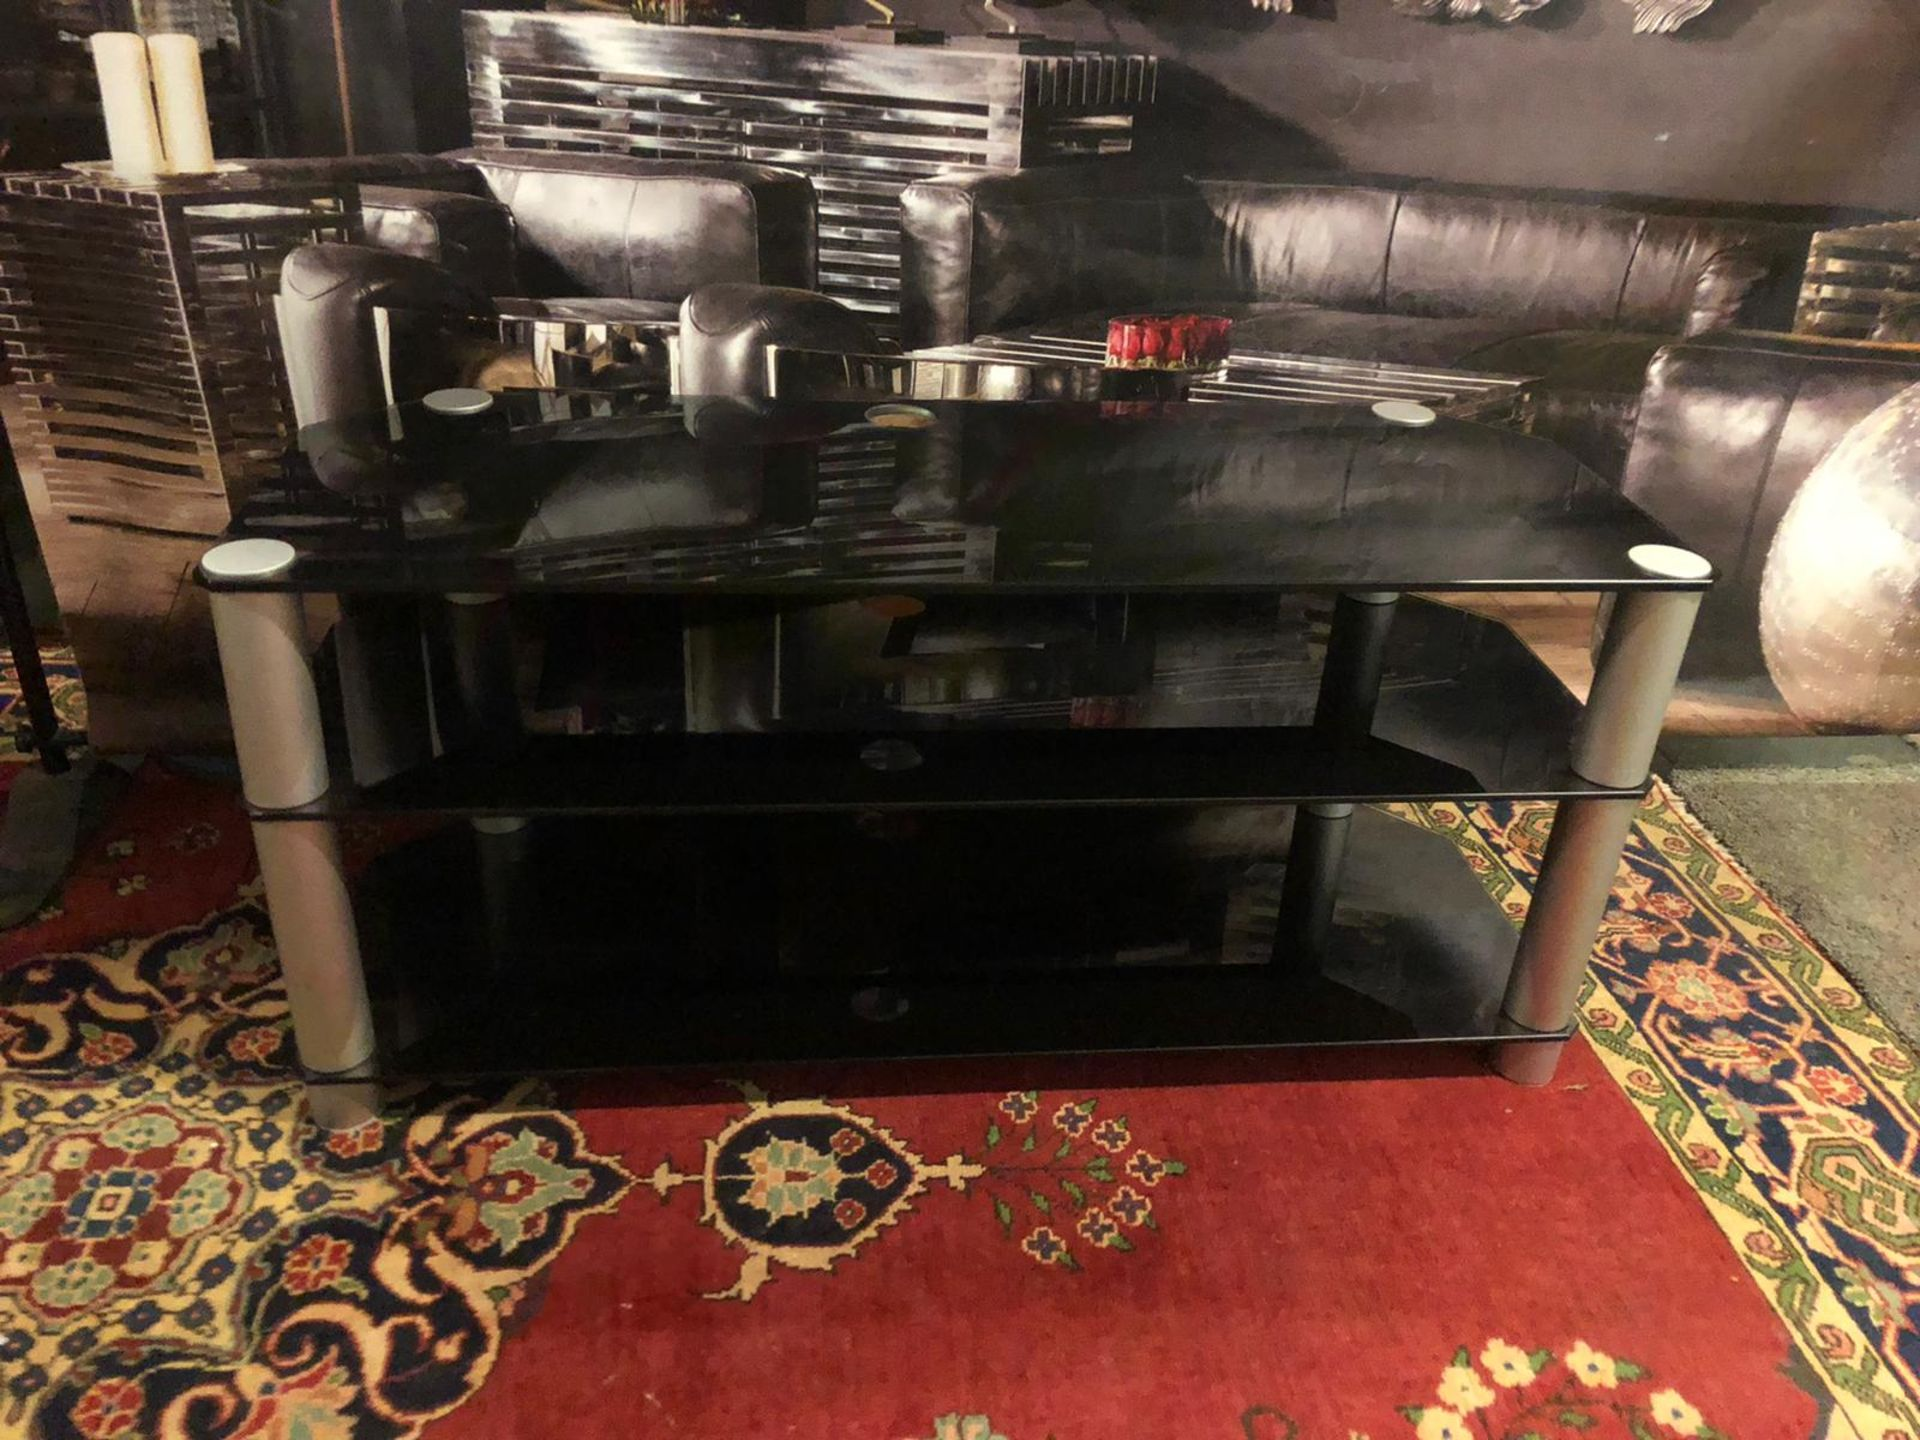 3-Tier TV Media Stand Component Console Multipurpose Shelf Display-Black 120 x 45 x 54cm - Image 2 of 3